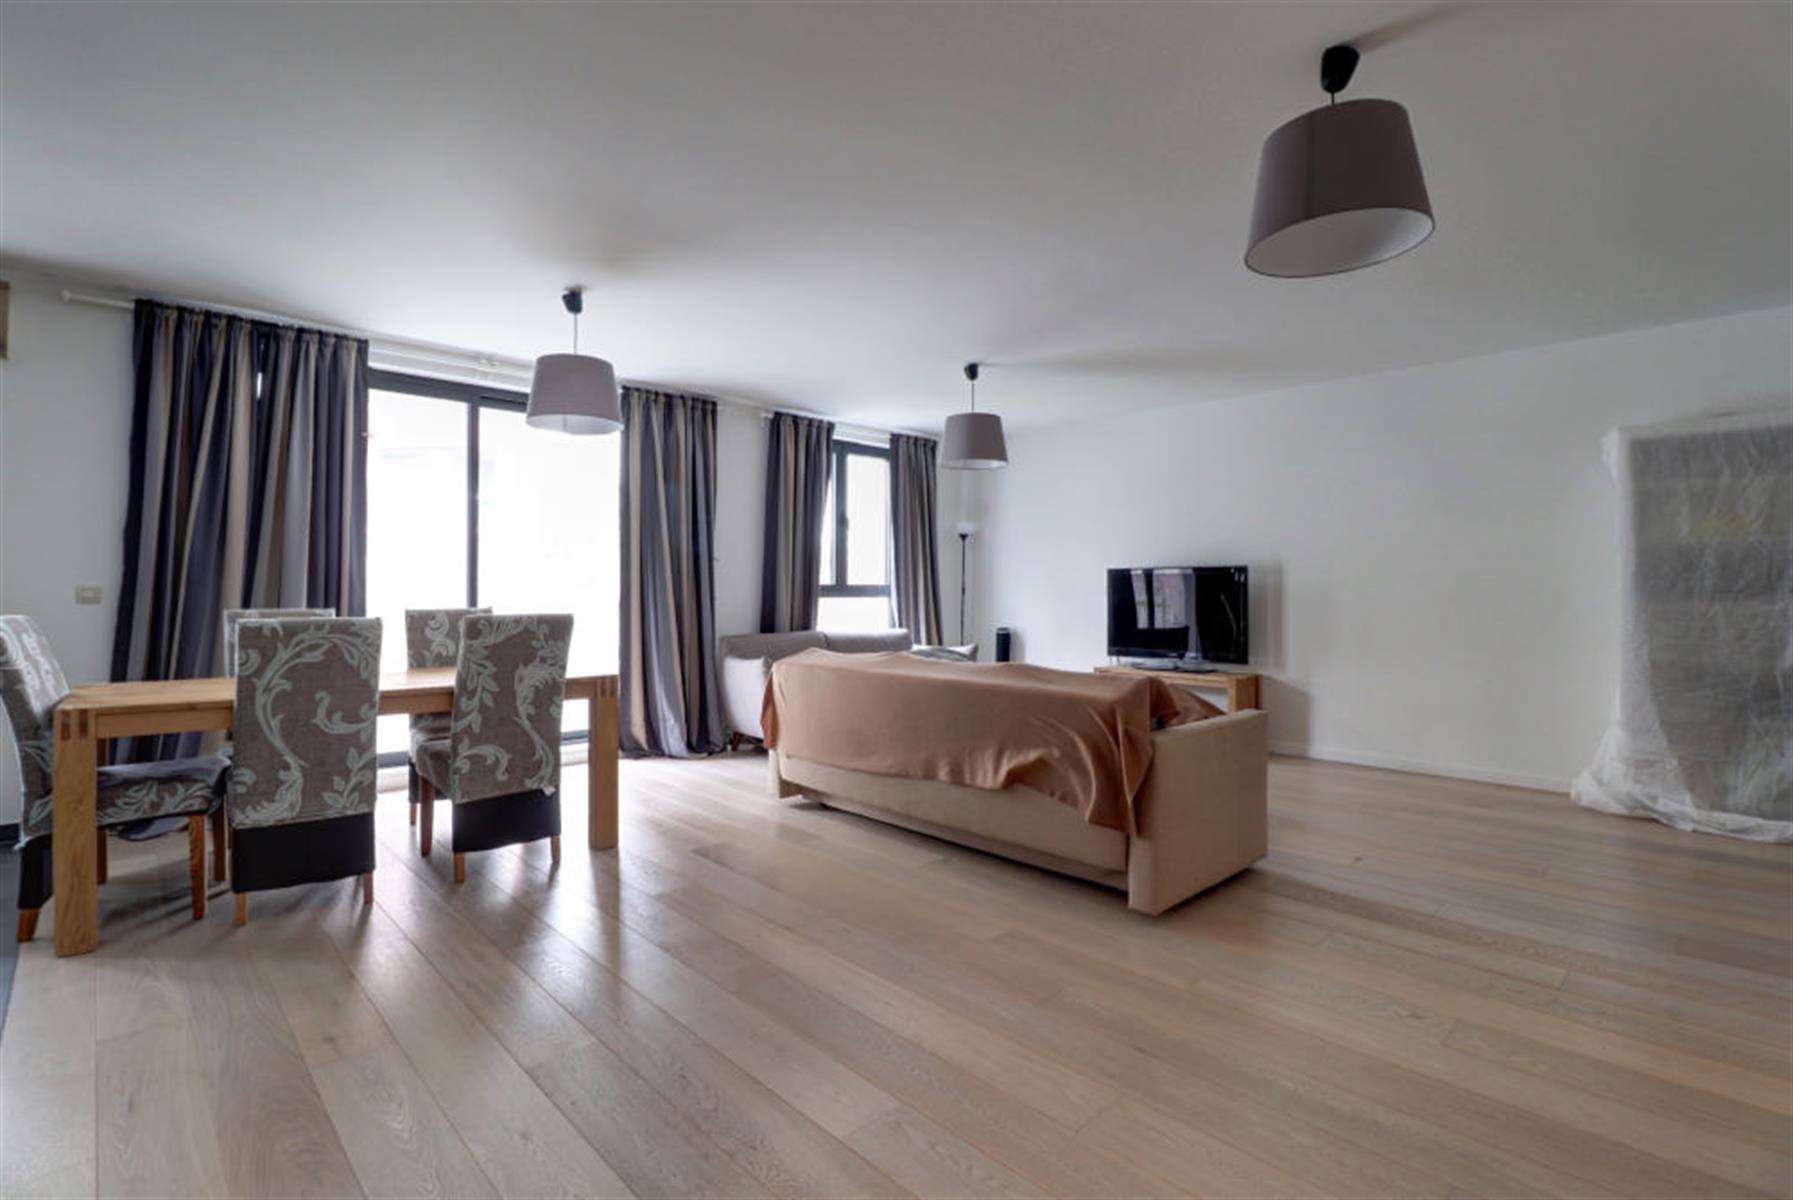 Flat - Etterbeek - #3905829-7